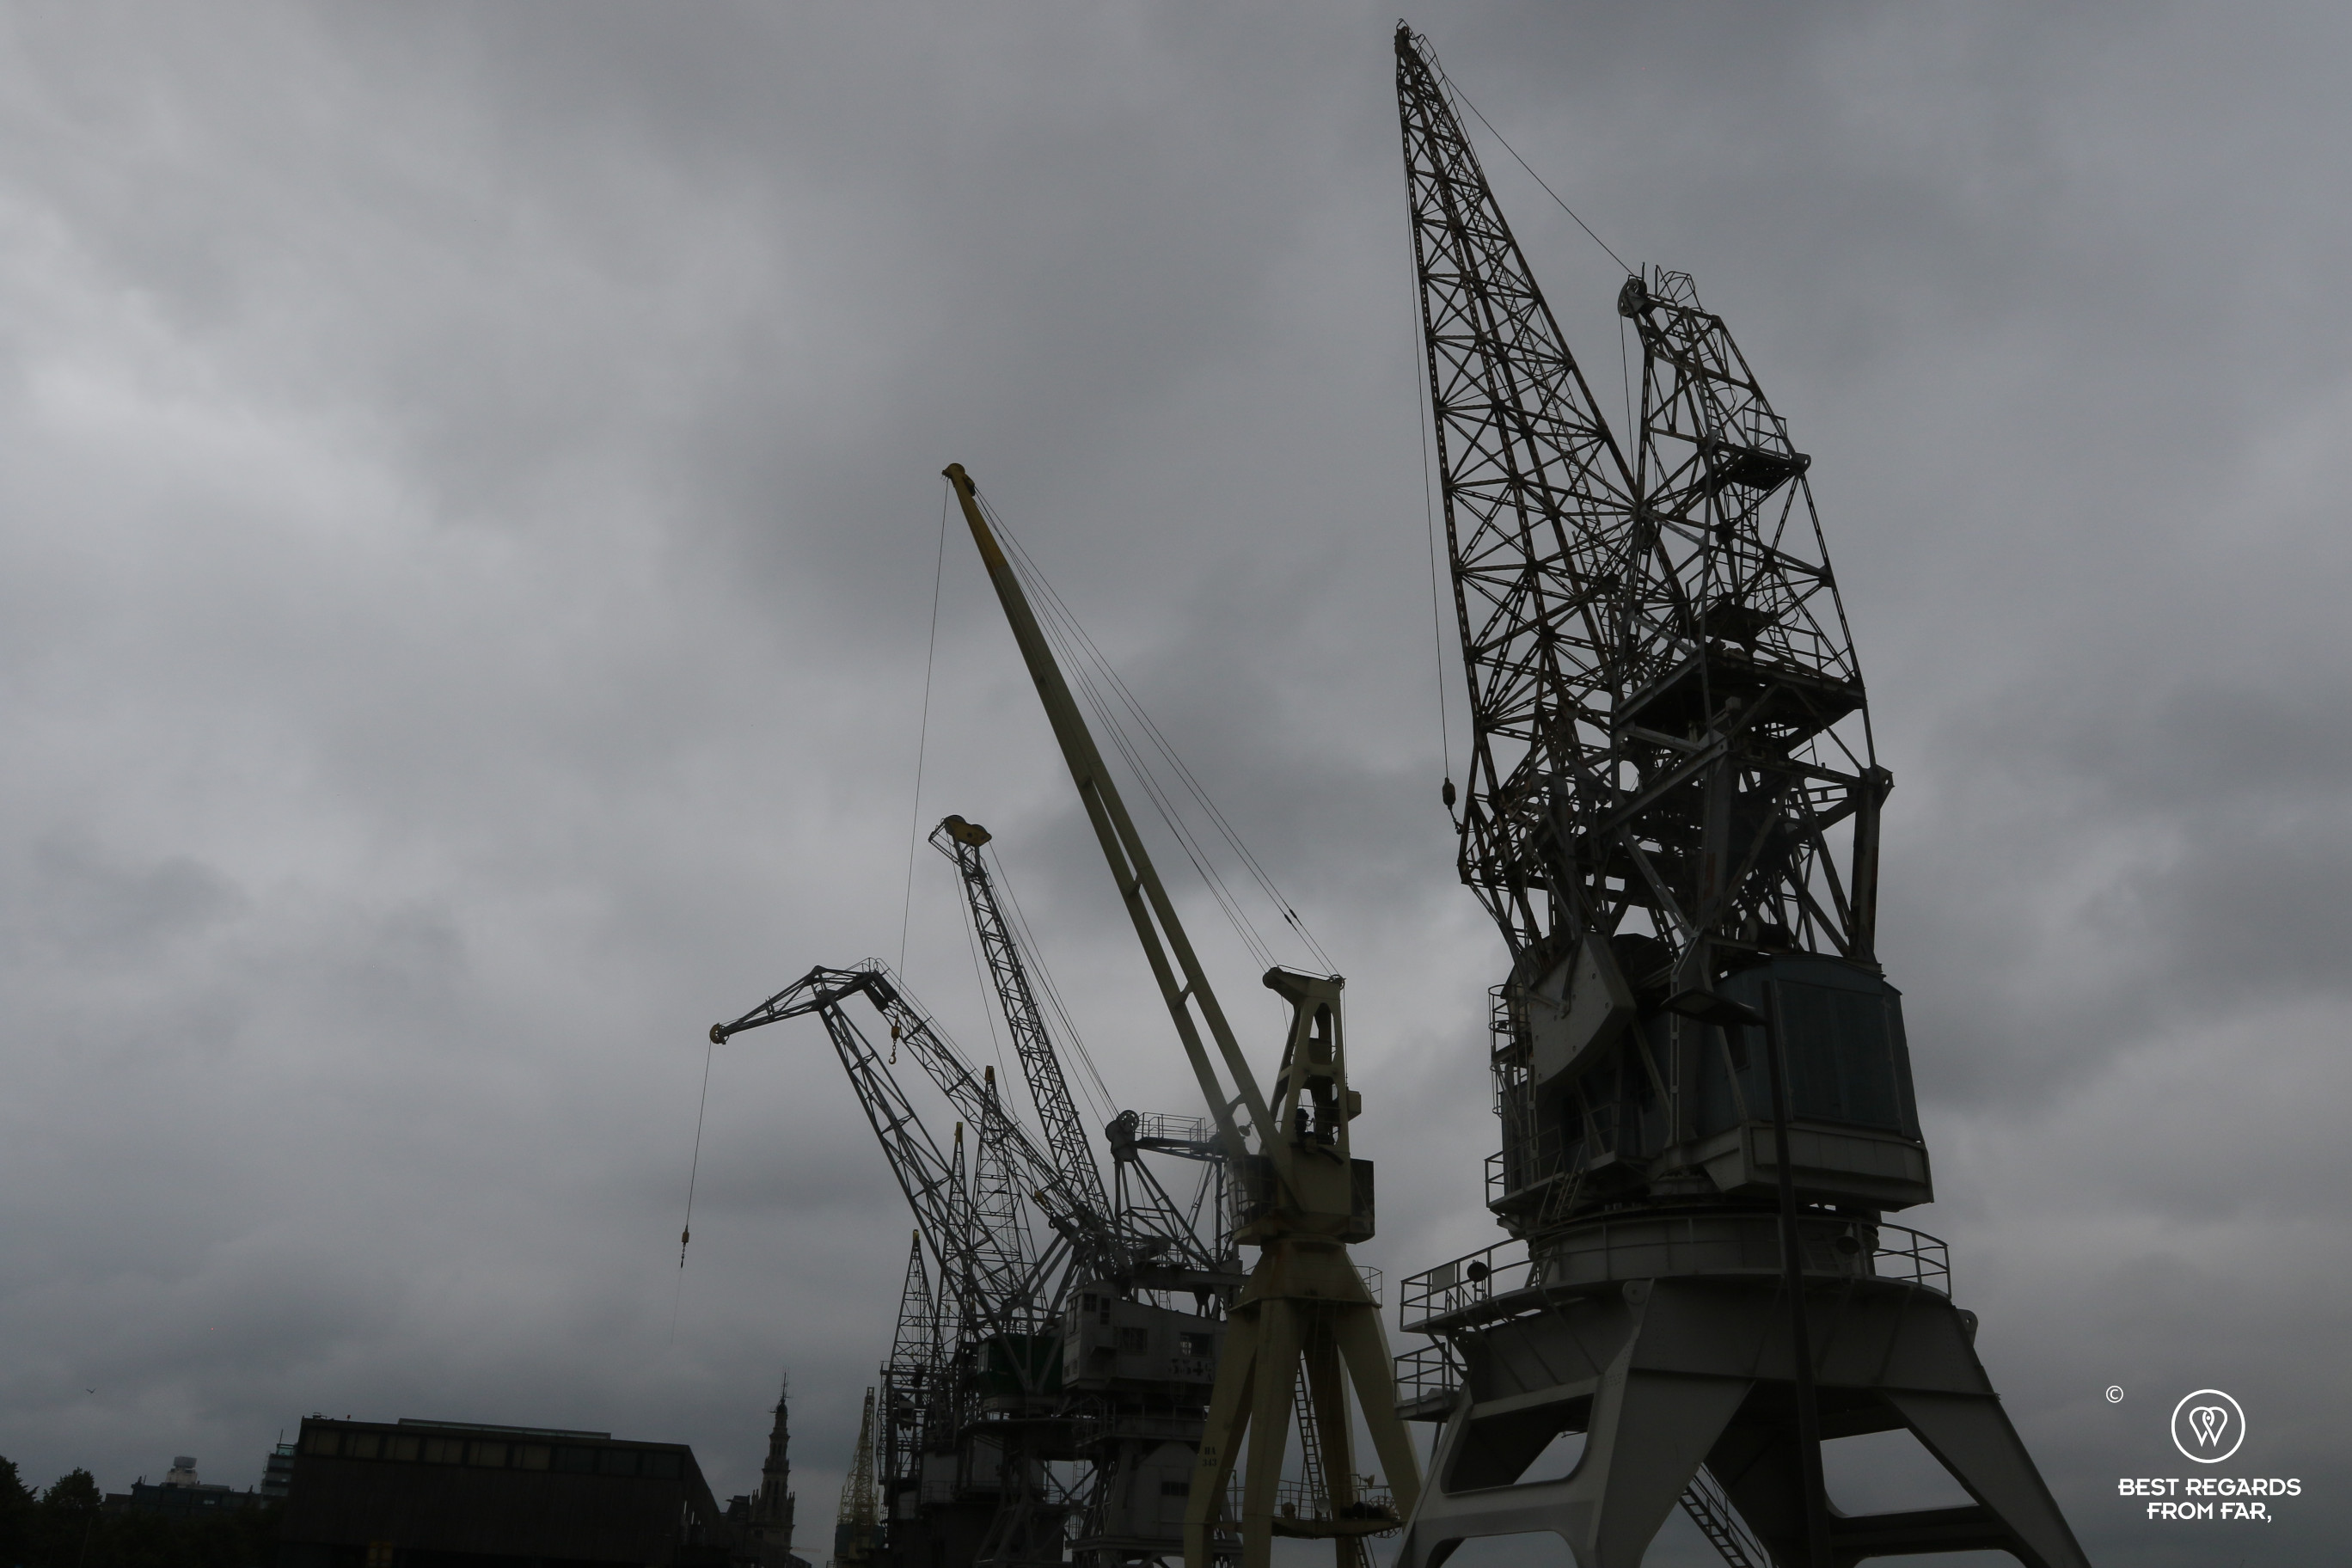 Black and white harbour cranes, Antwerp, Belgium